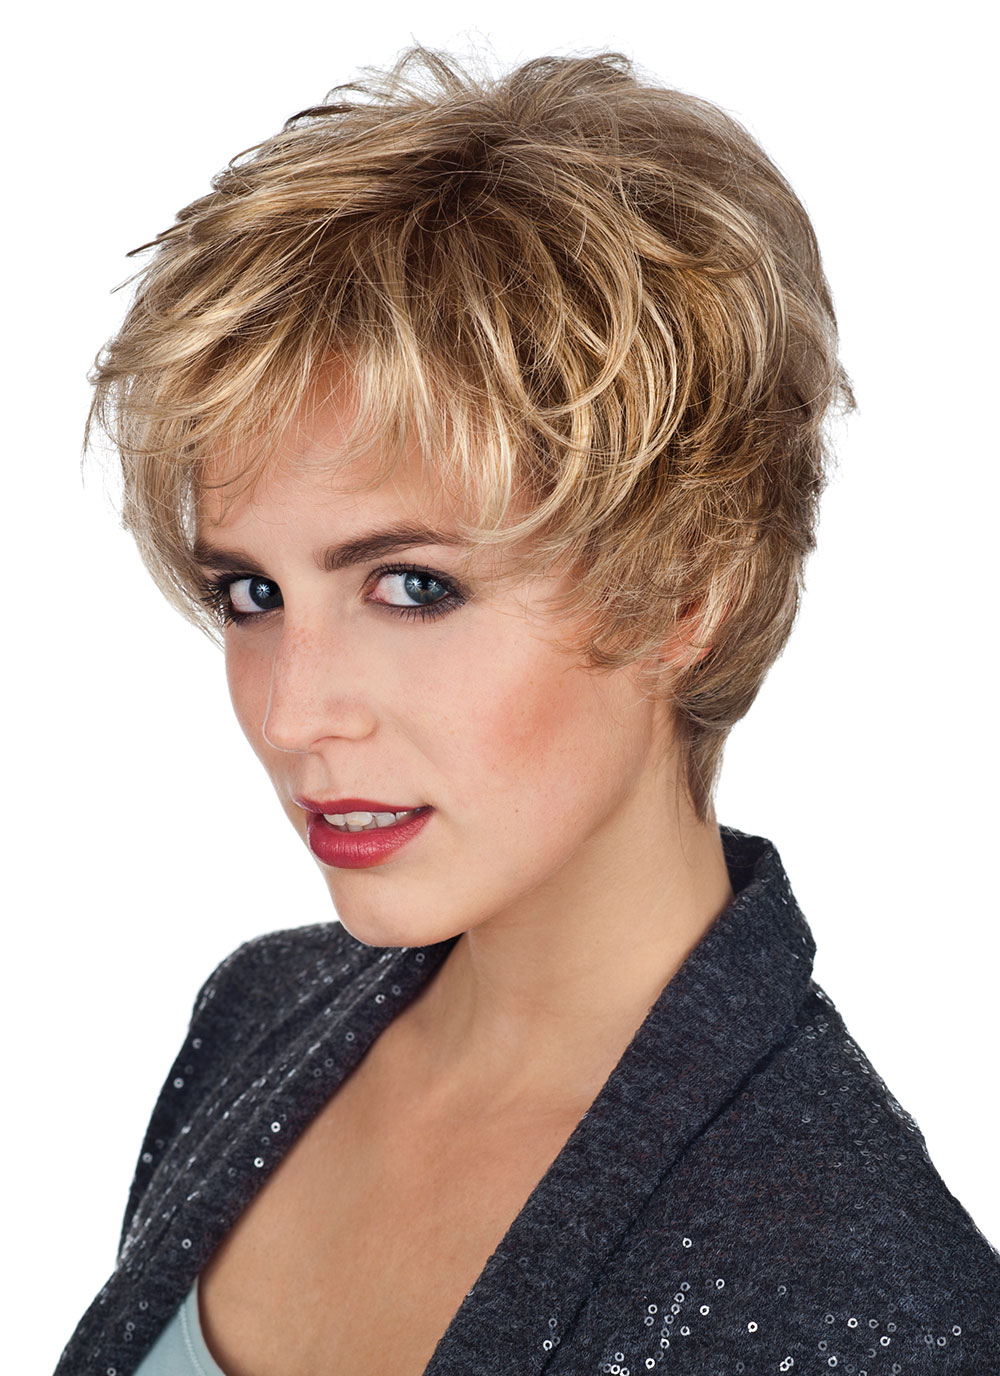 Gisela Mayer Perücke: Dallas Mono Lace Deluxe Large gross